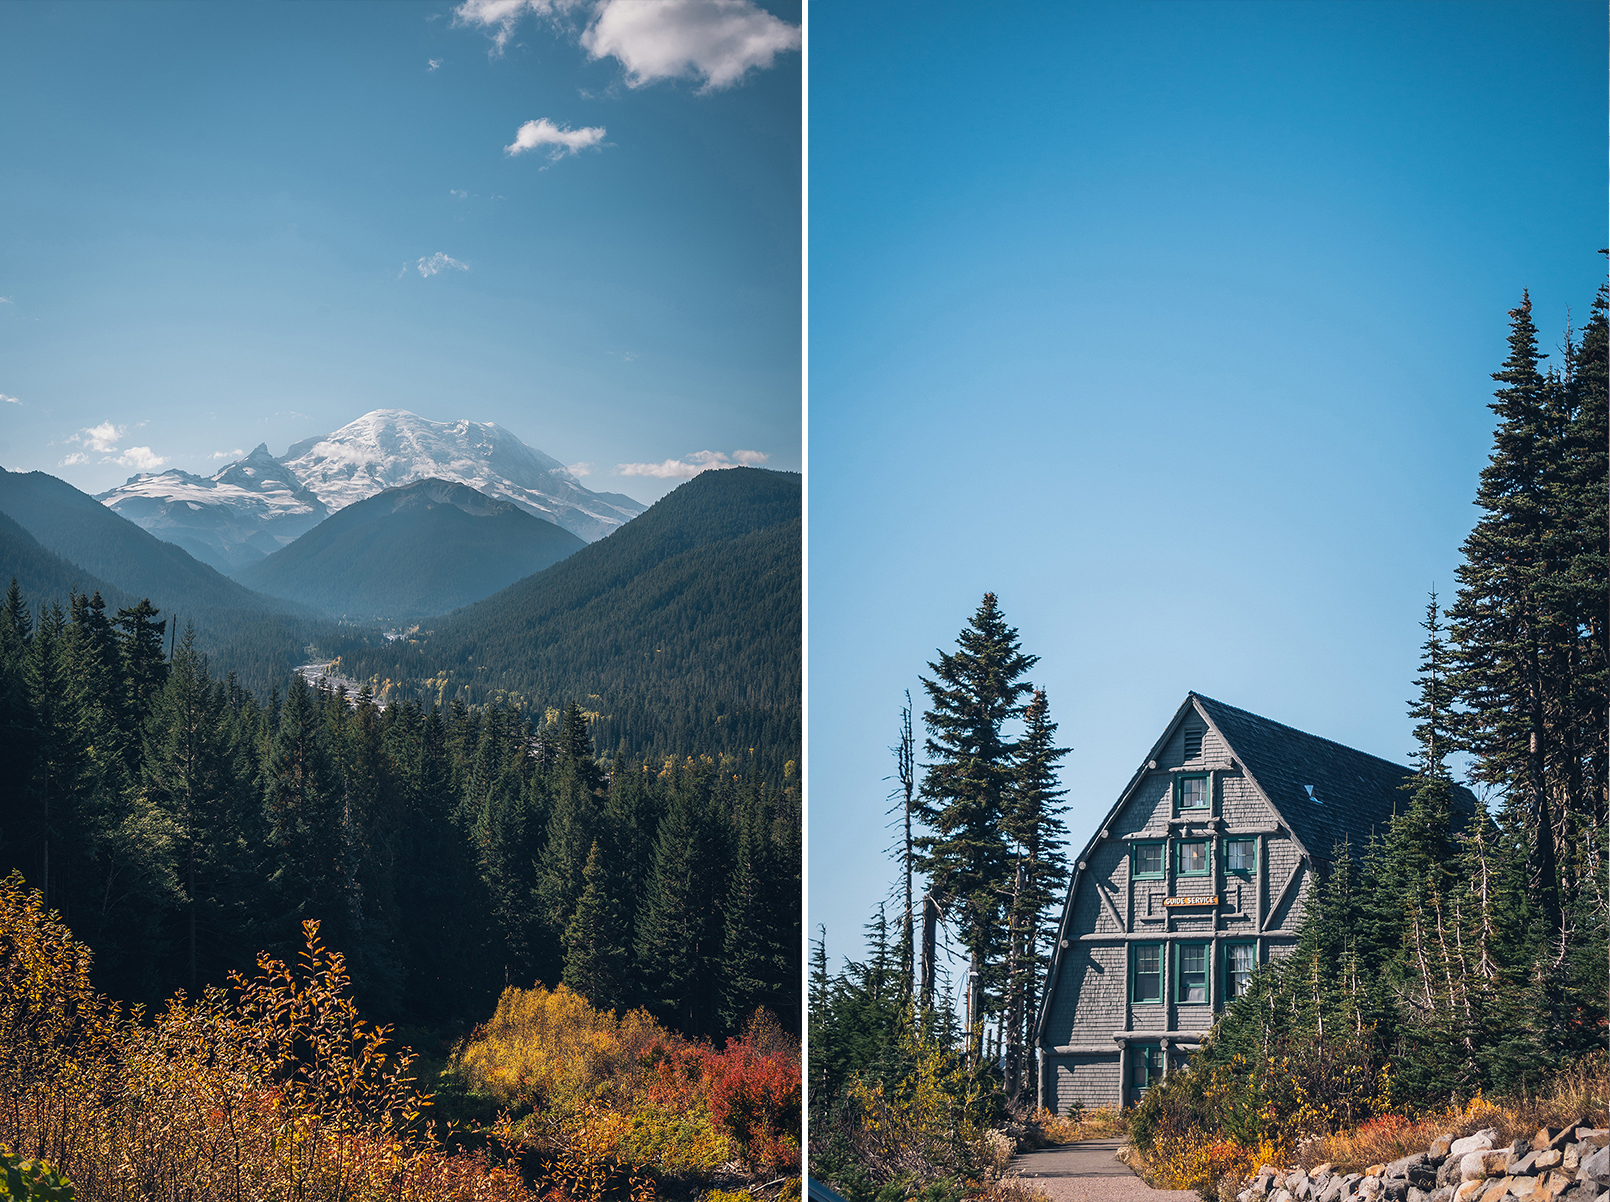 USA-Kanada-PNW-Pazifischer-Nordwesten-Landschaftsfotografie-Niklas-Coen-Fotografie-Aachen (84)